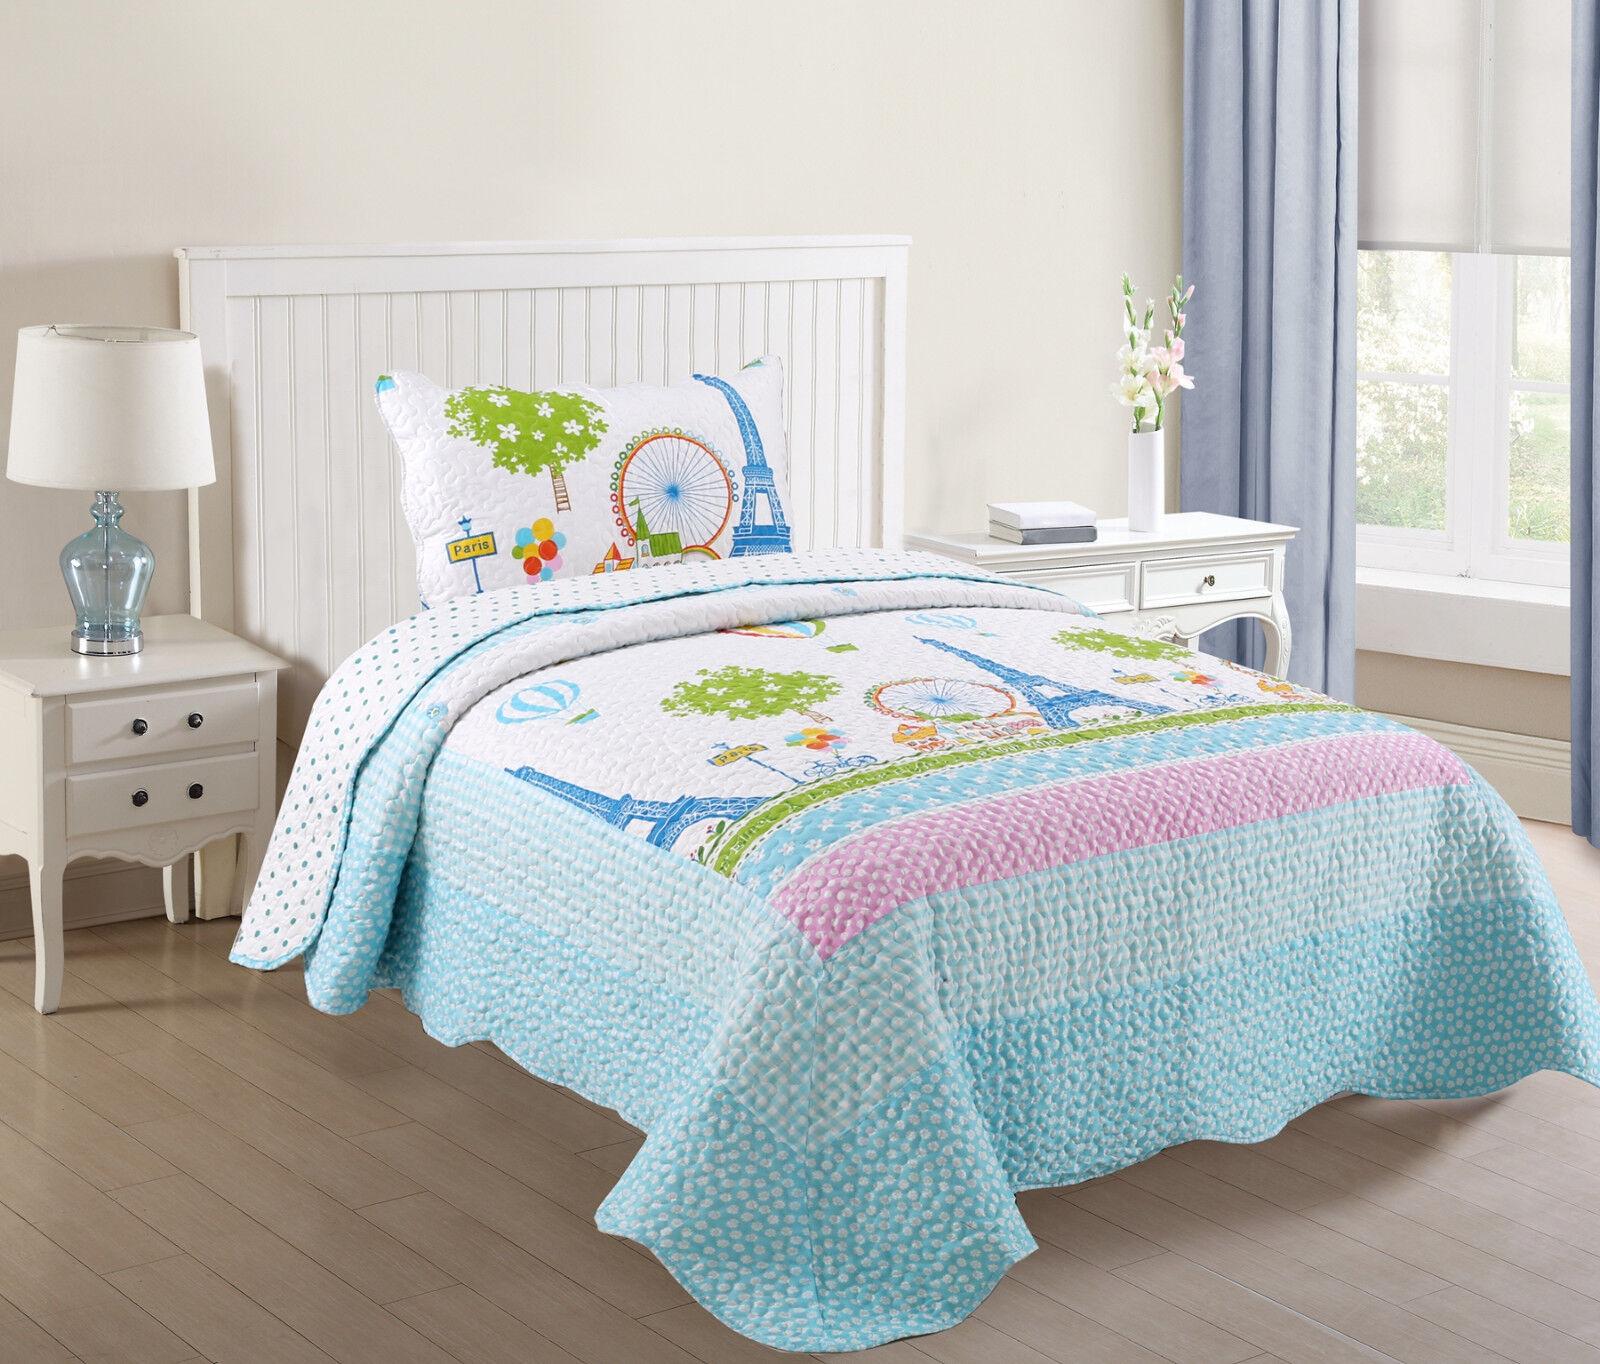 2 Pcs Kids Quilts Bedspread Set Throw Blanket for Teens Girl